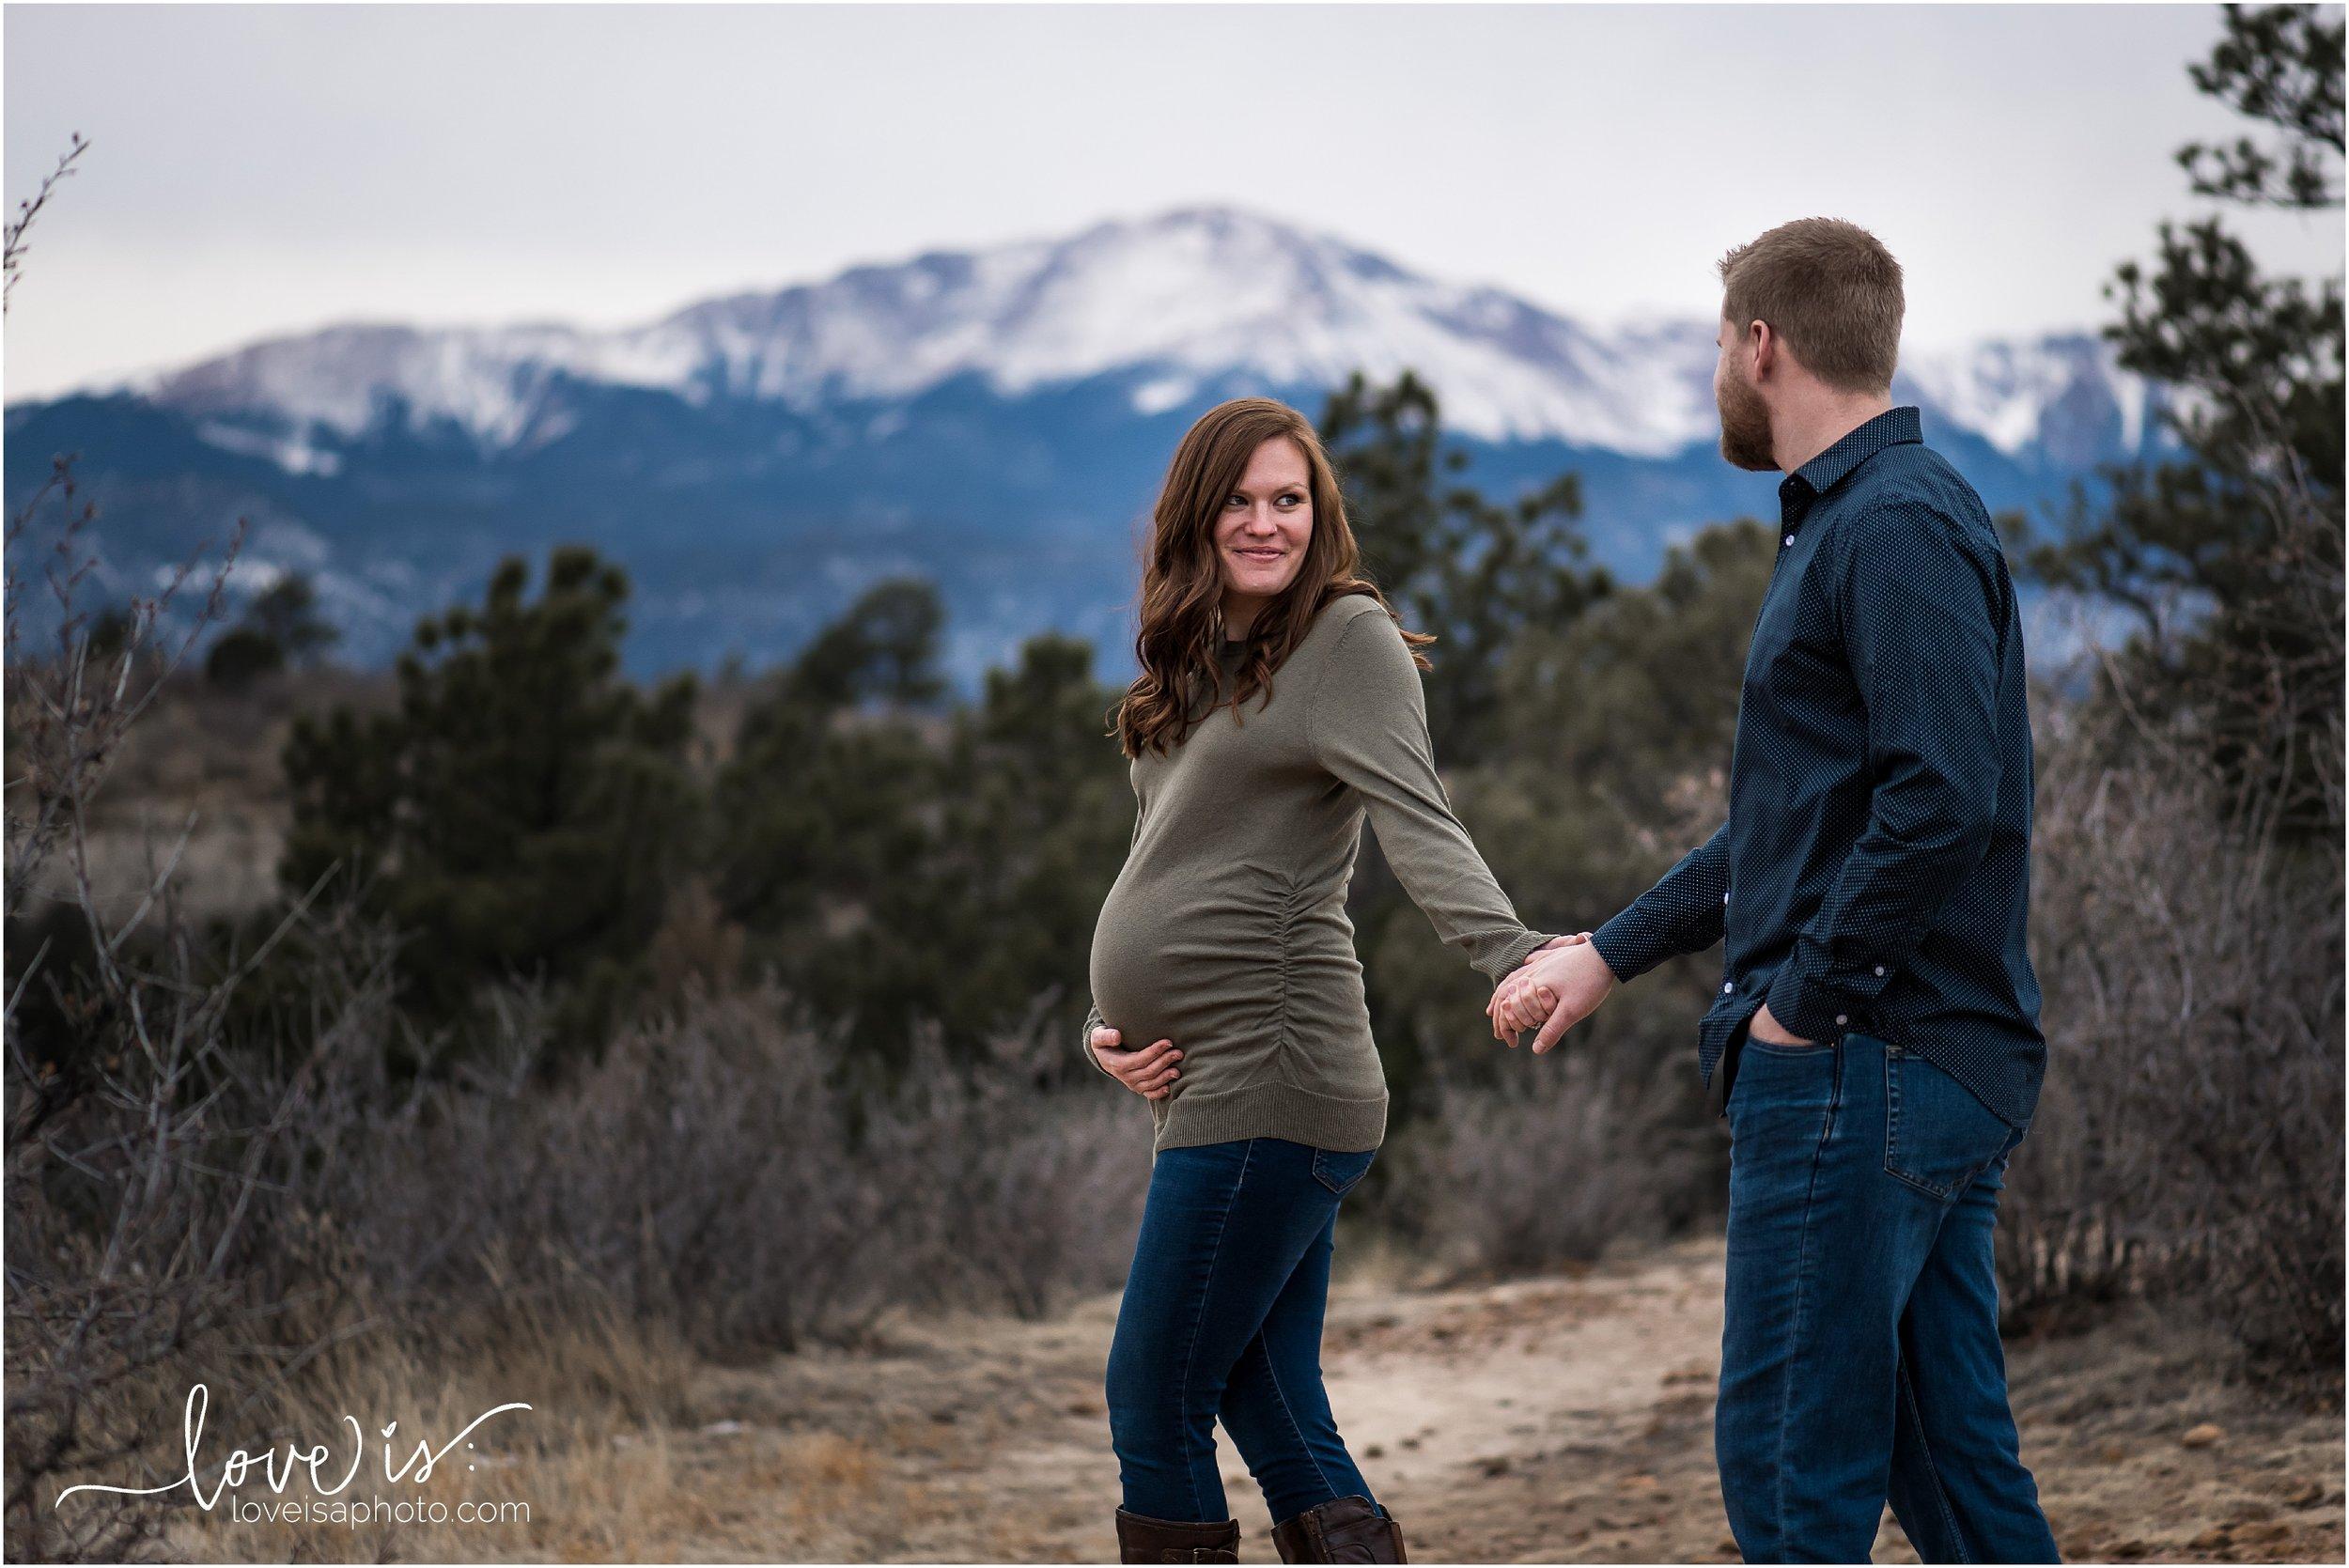 Colorado Birth Photographer, Colorado Birth Photography_5996.jpg